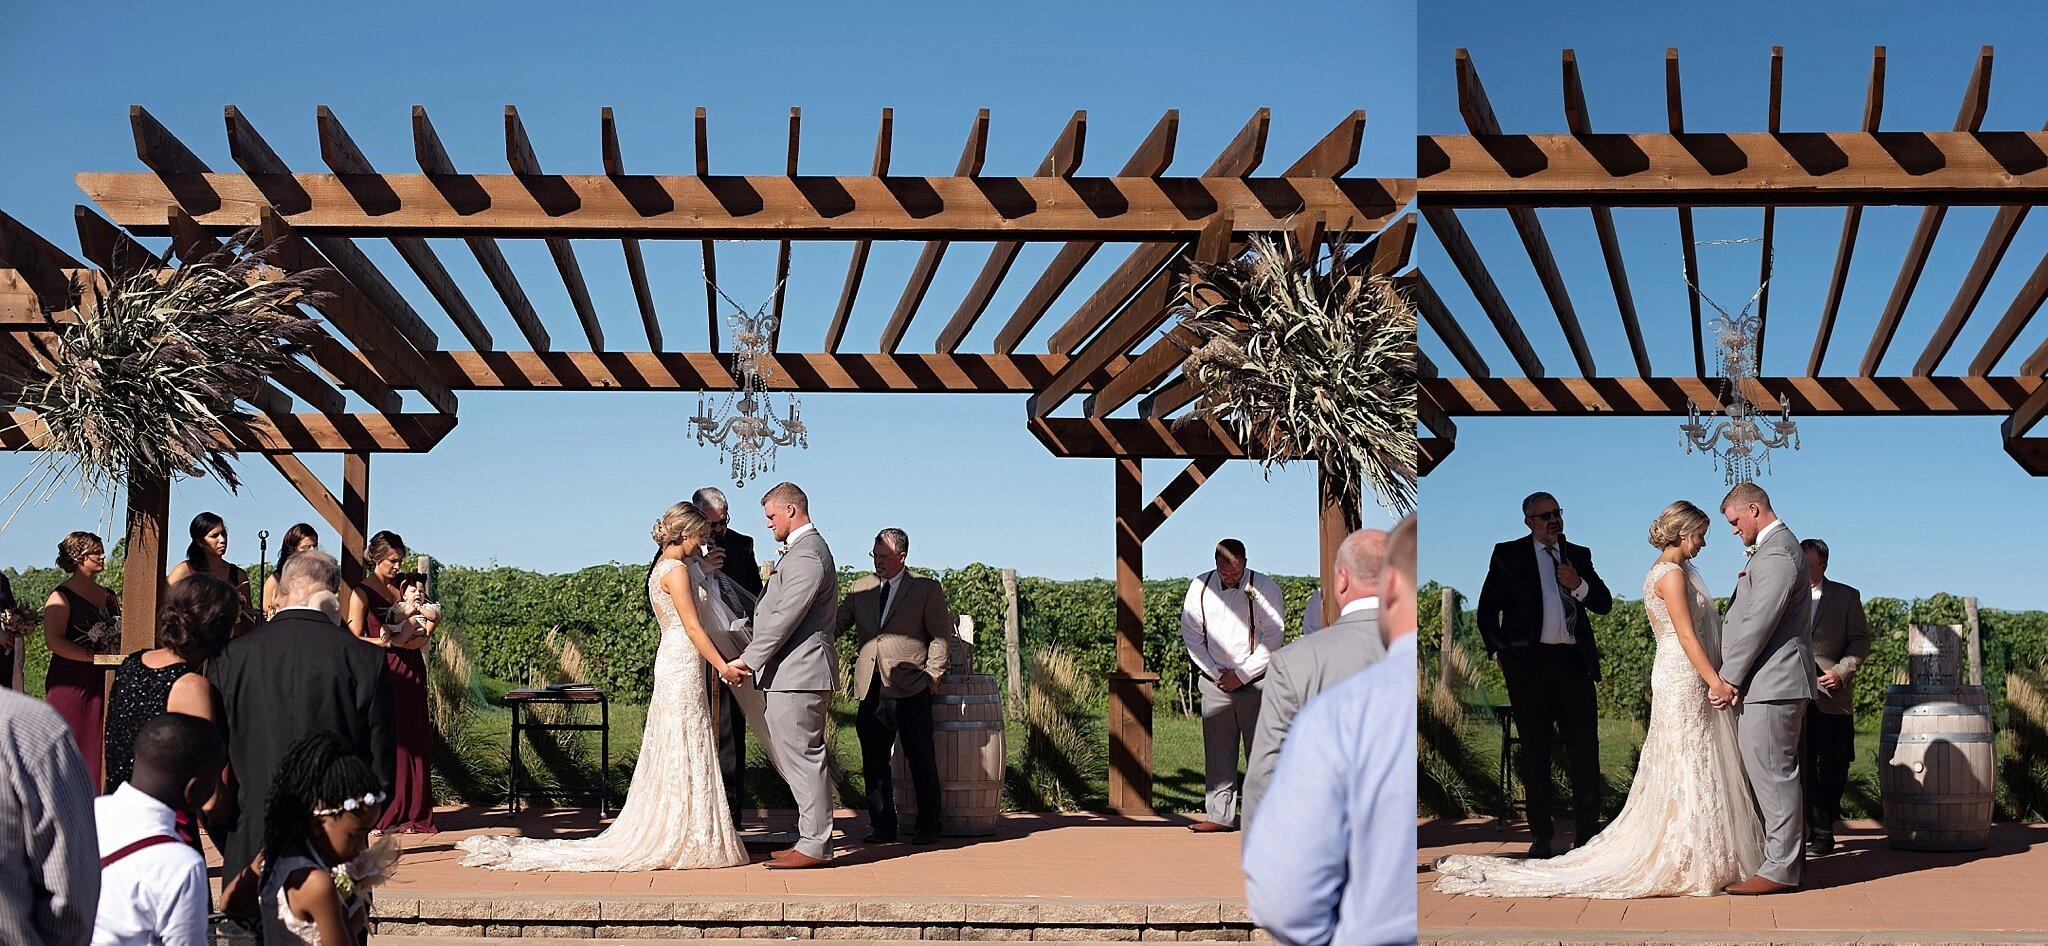 calico skies winery wedding